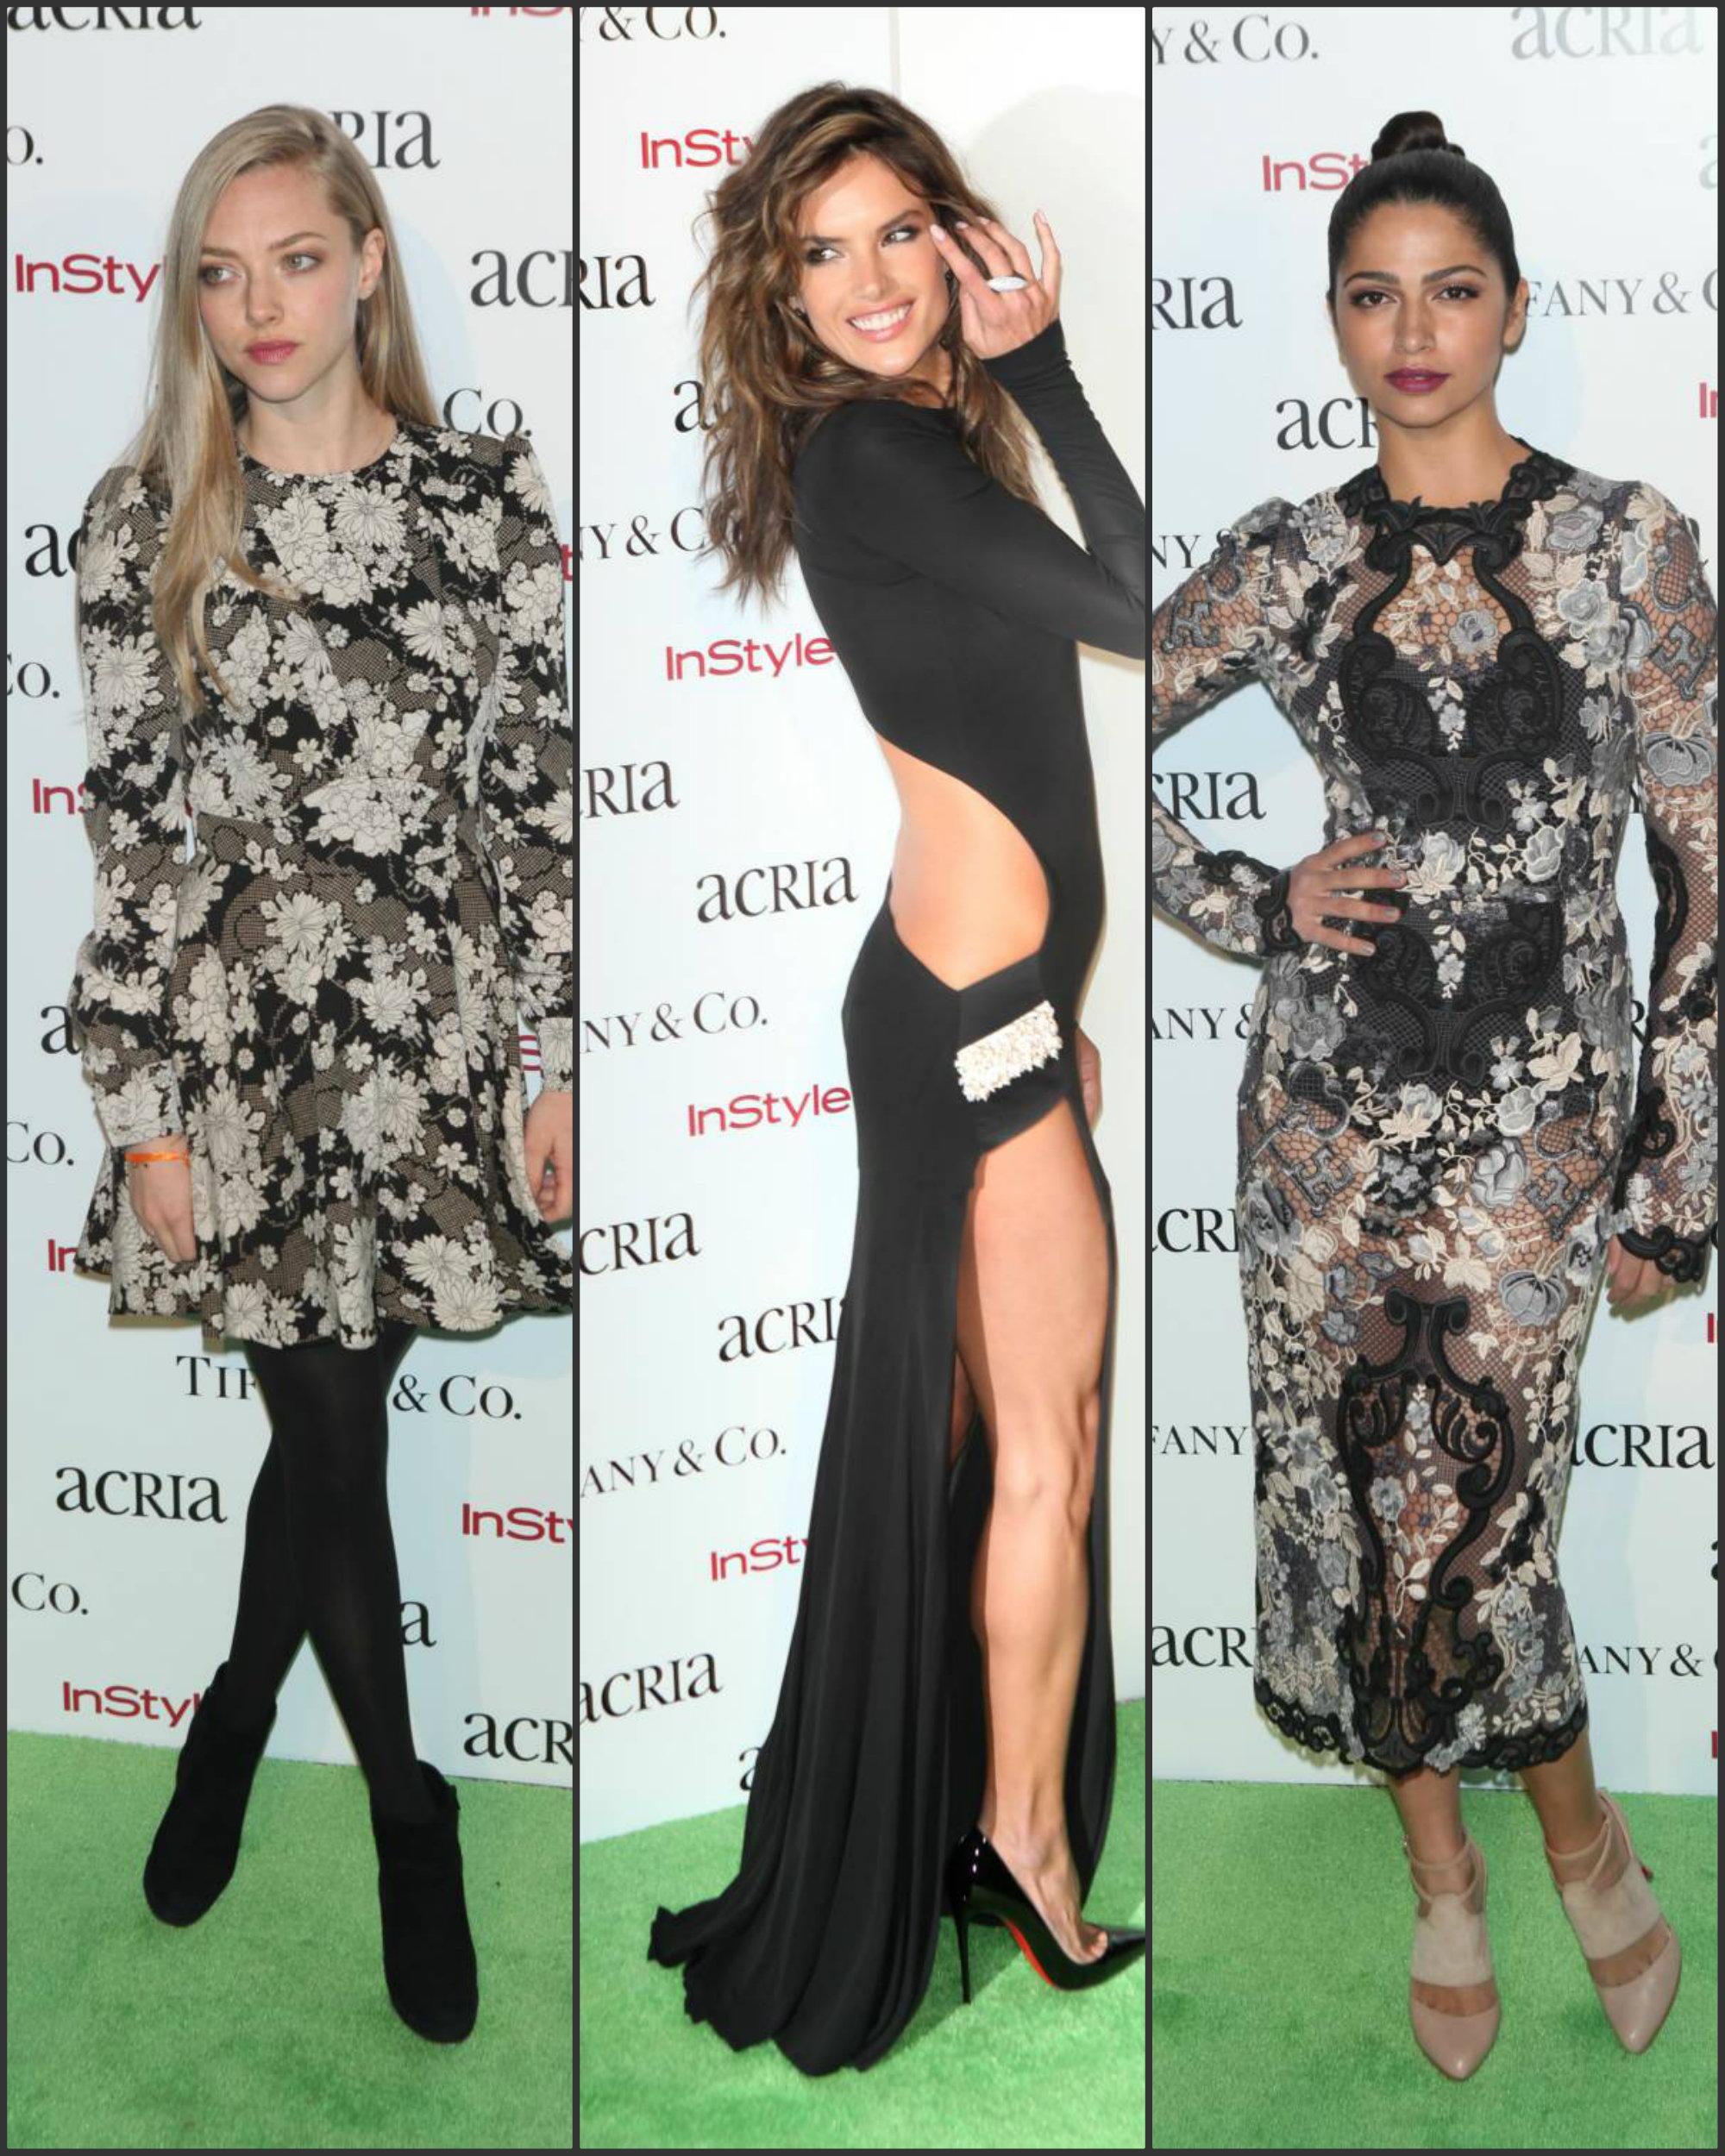 Amanda-Seyfried-Camila-Aves-Alessandra-Ambrosio-at-the-19th-Annual-Acria-Holiday-Dinner